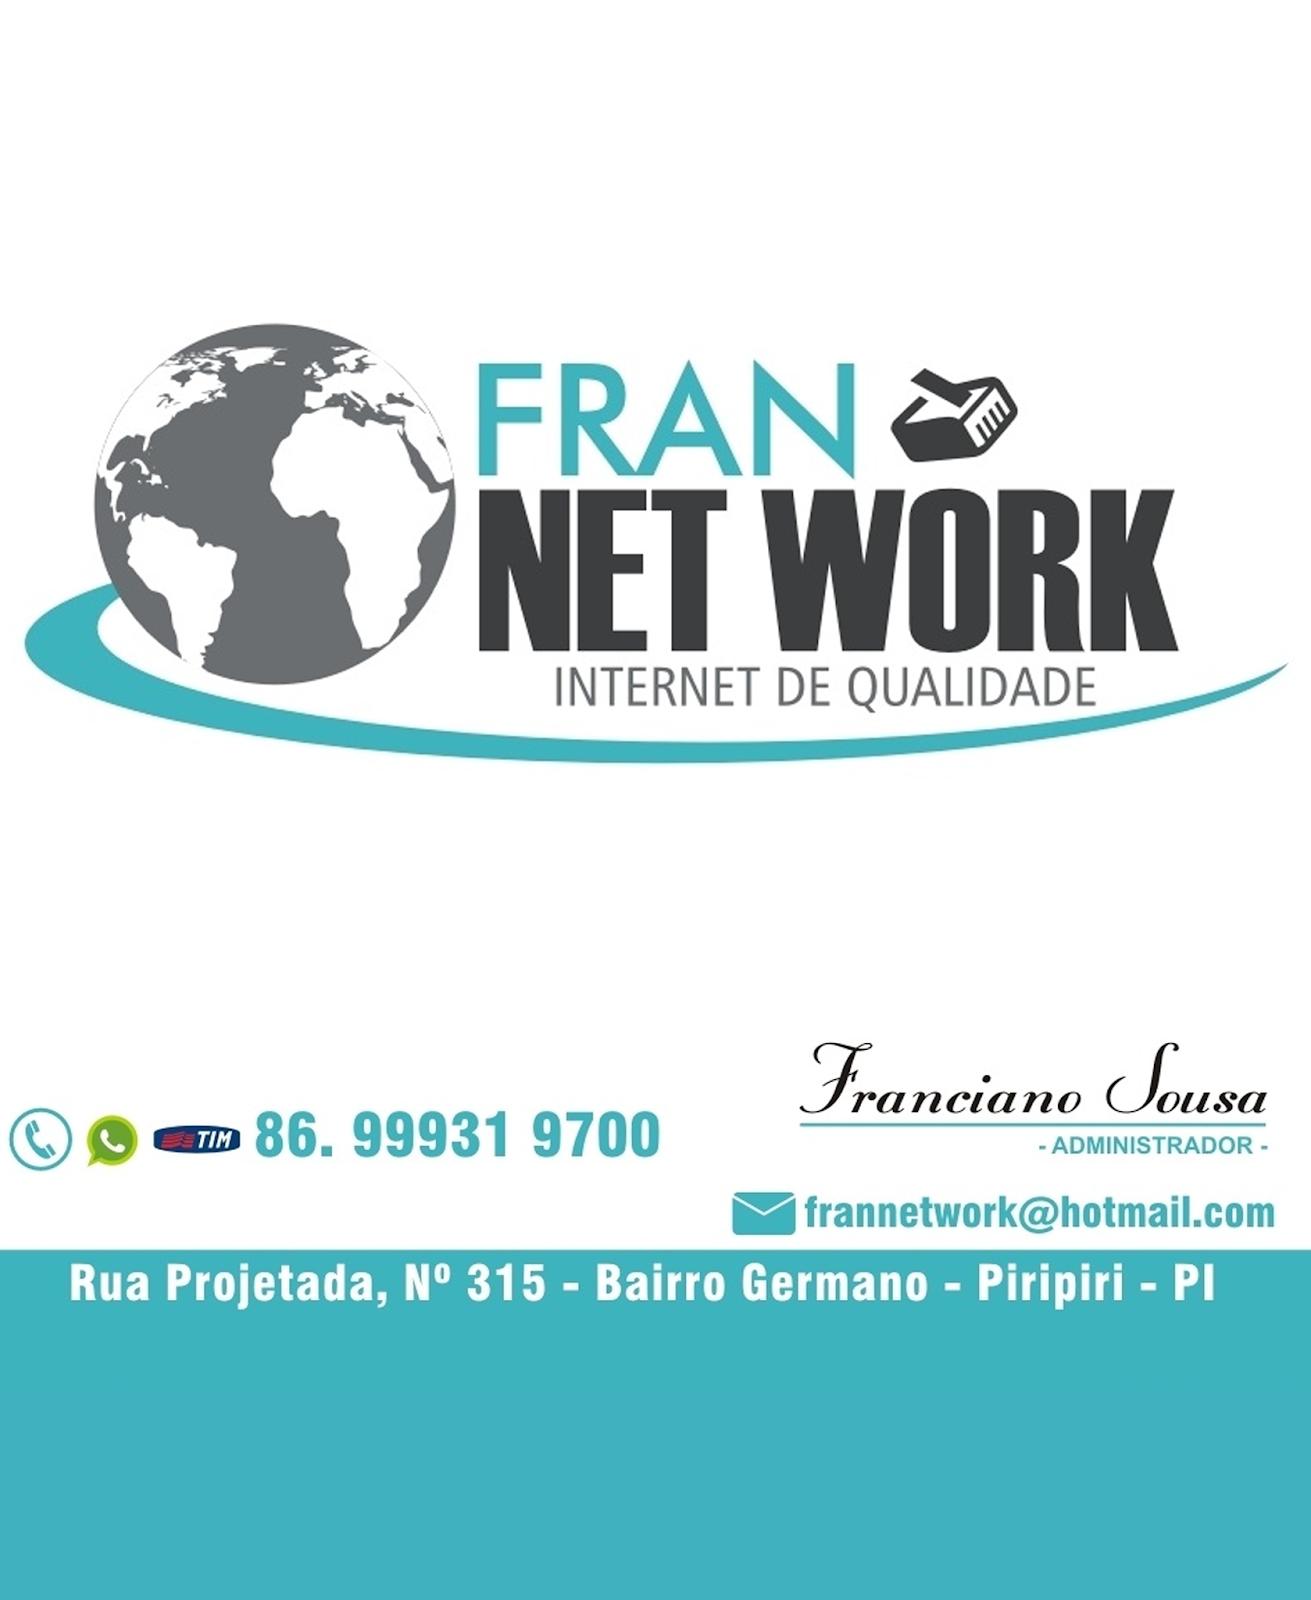 FRAN NET WORK